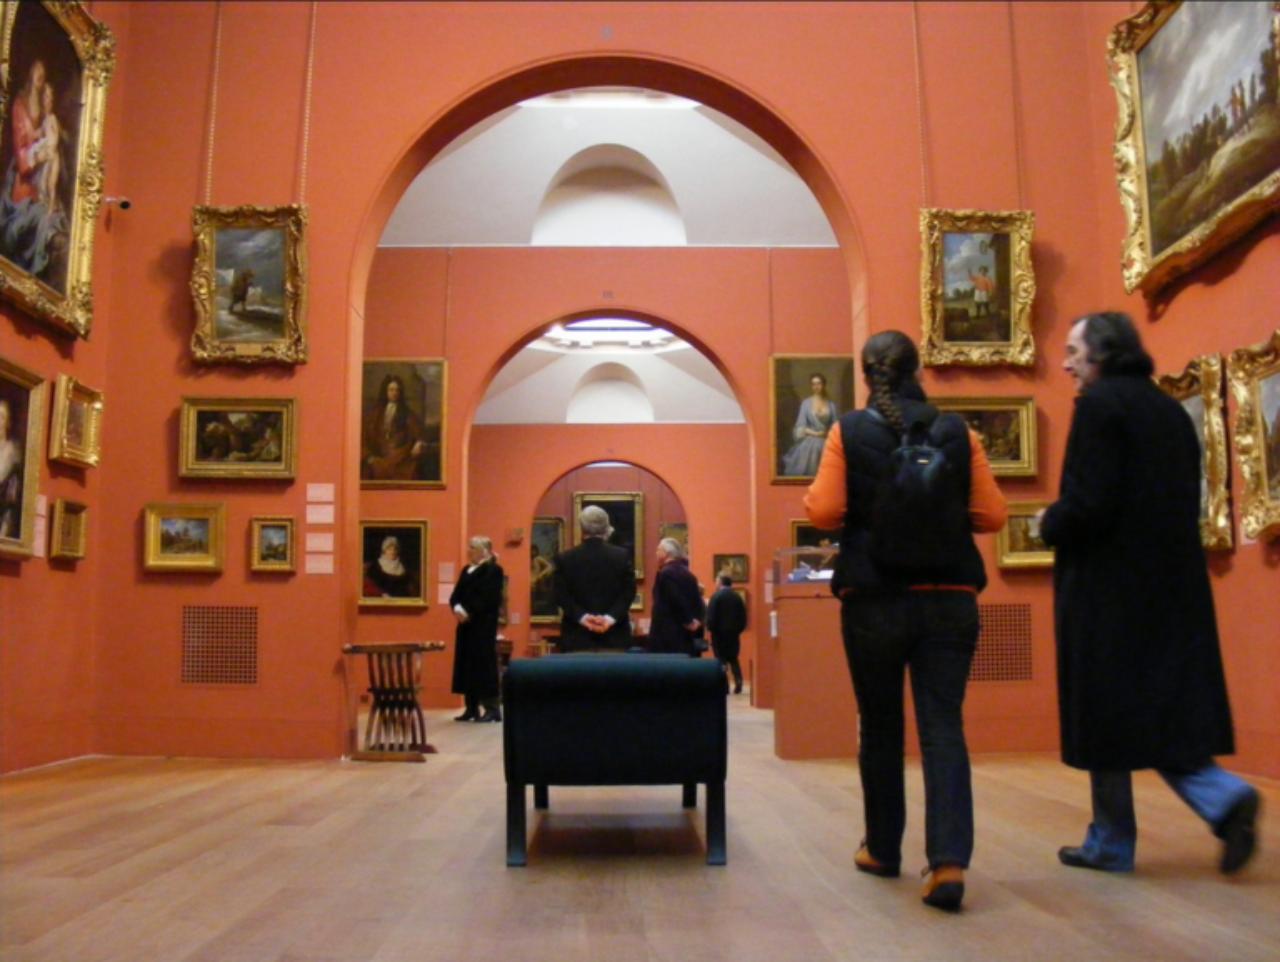 Gallery Interior (Image: Flickr)